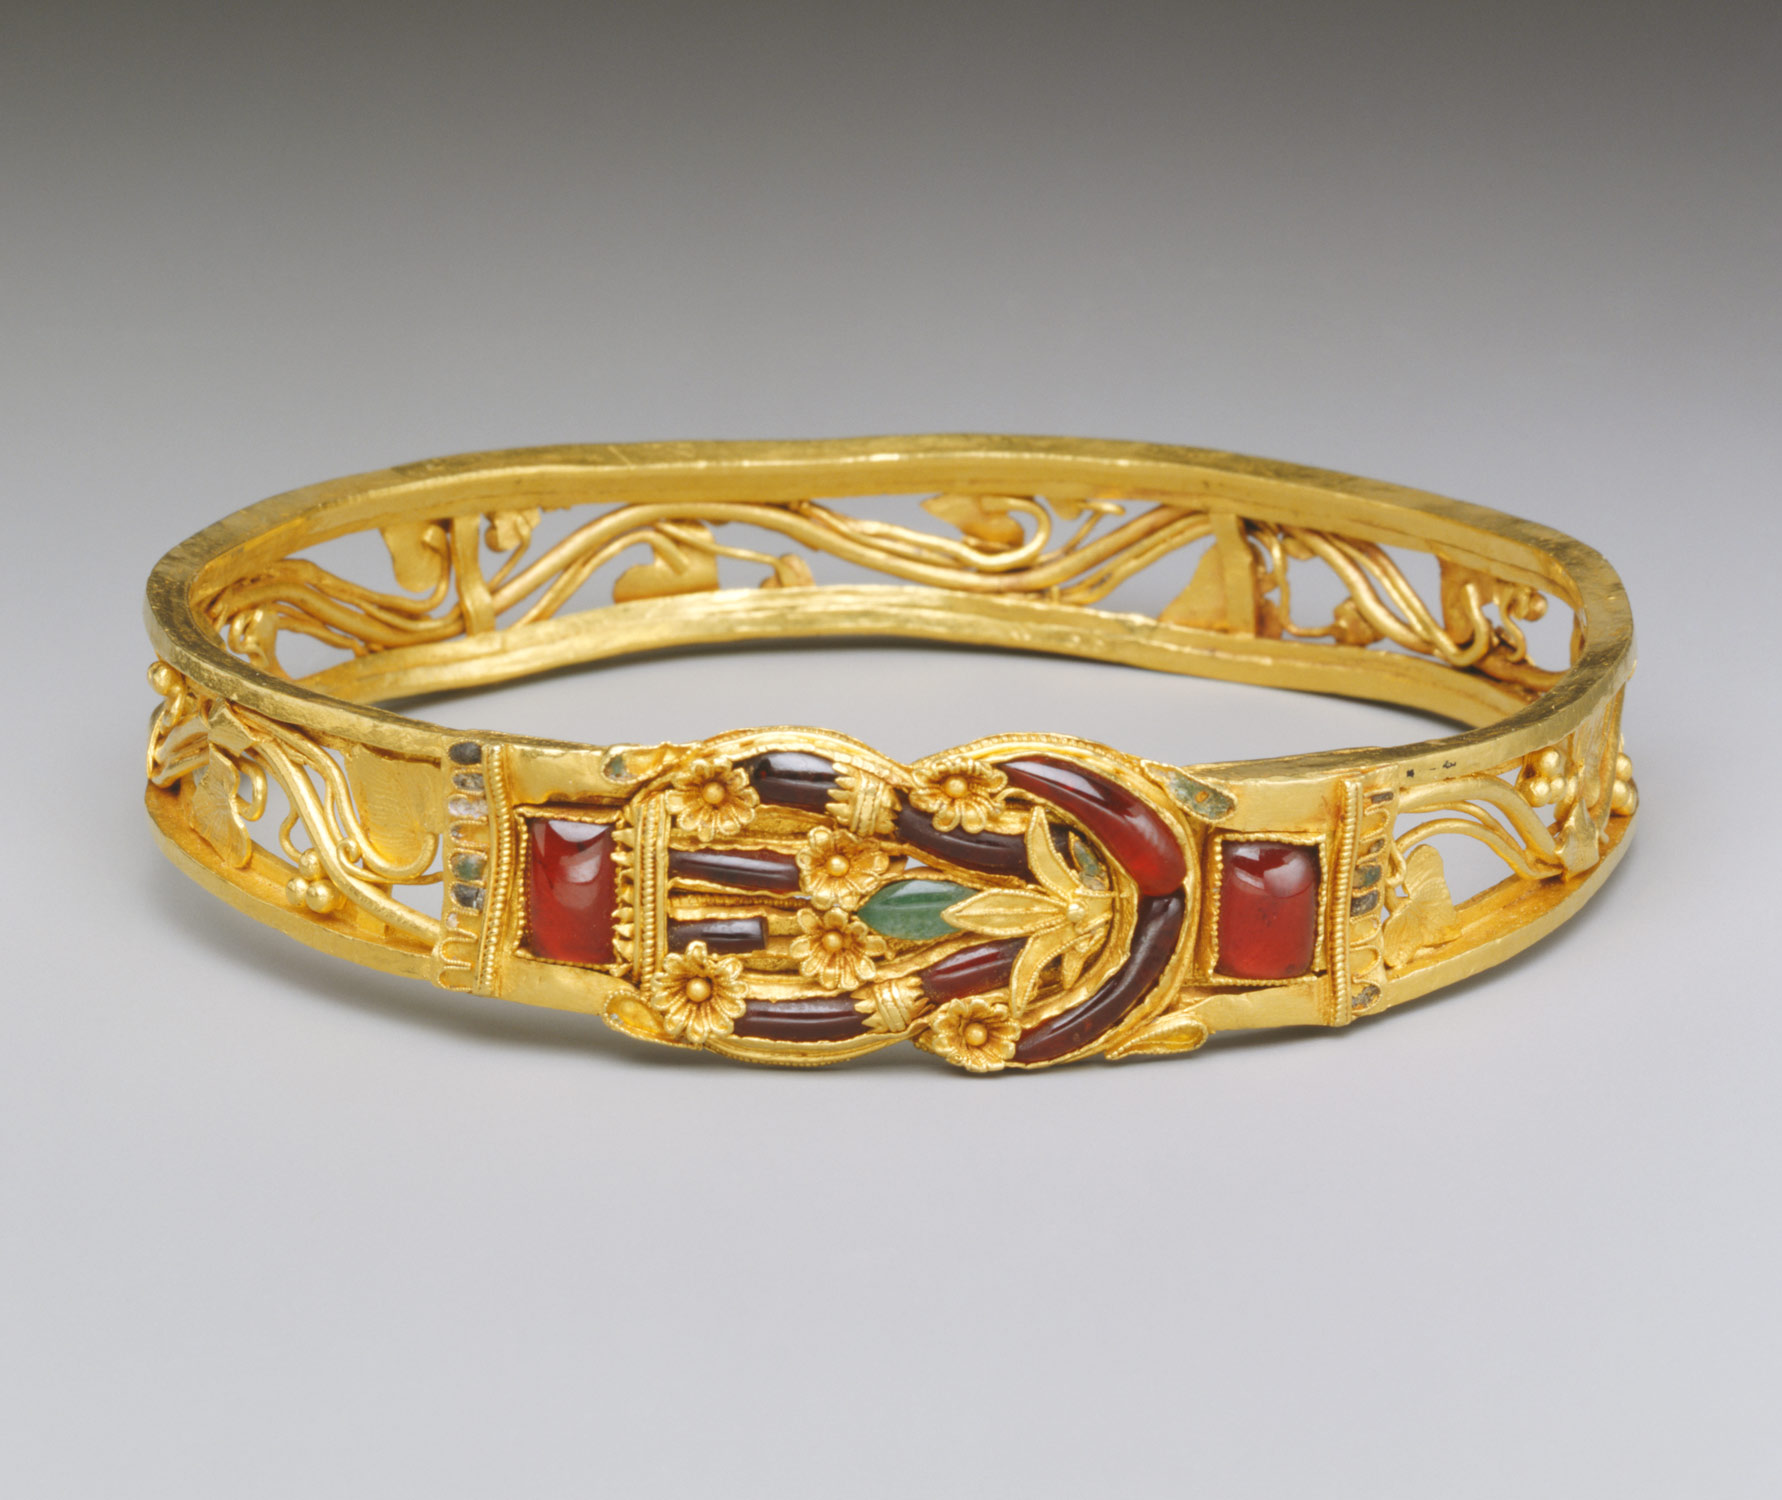 A 2,200 year old bracelet